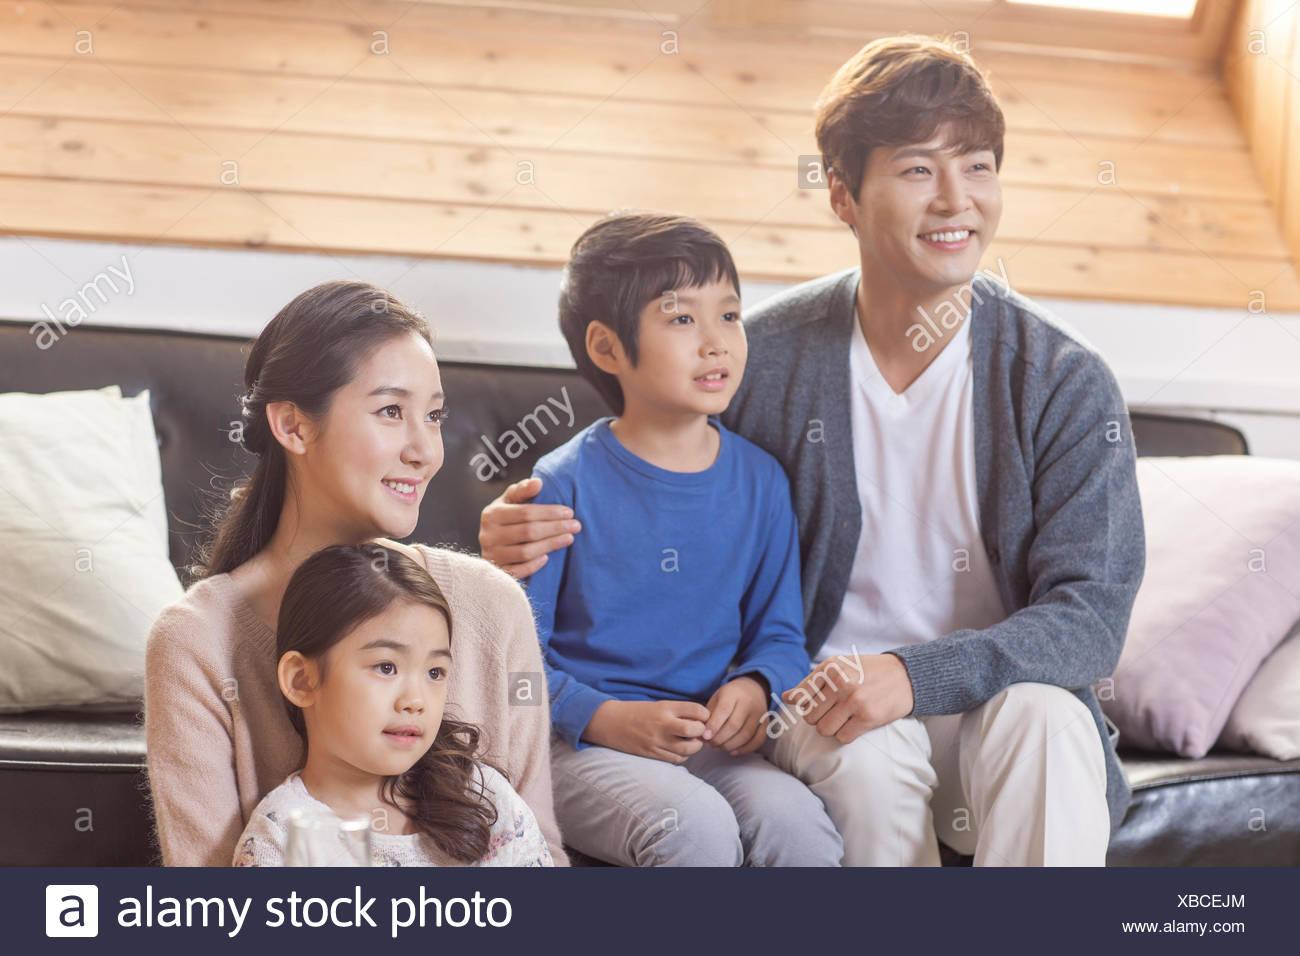 Harmonious family in living room - Stock Image